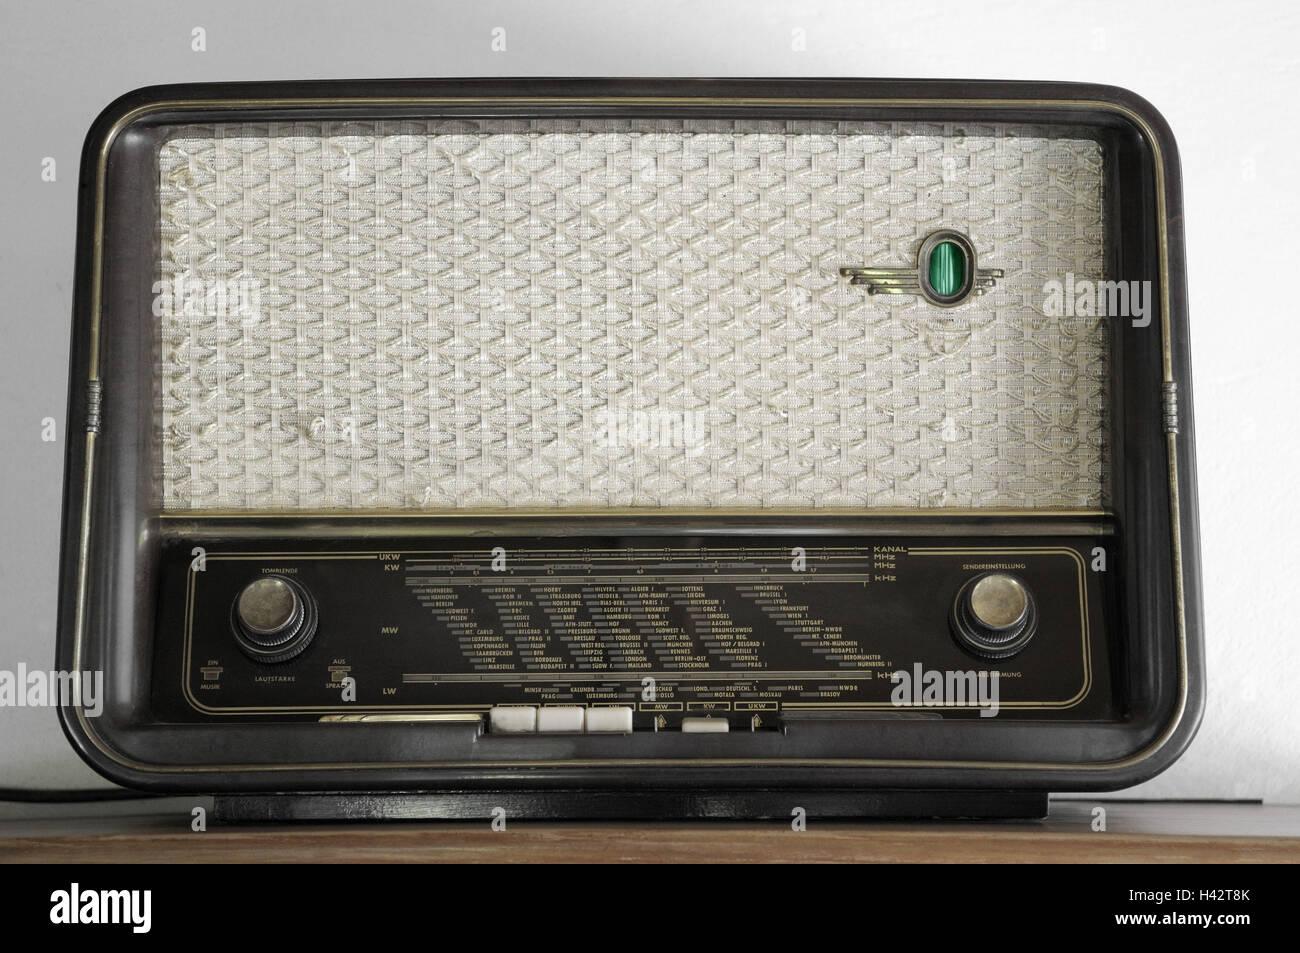 Radio, scale, rotary regulator, loudspeaker, - Stock Image